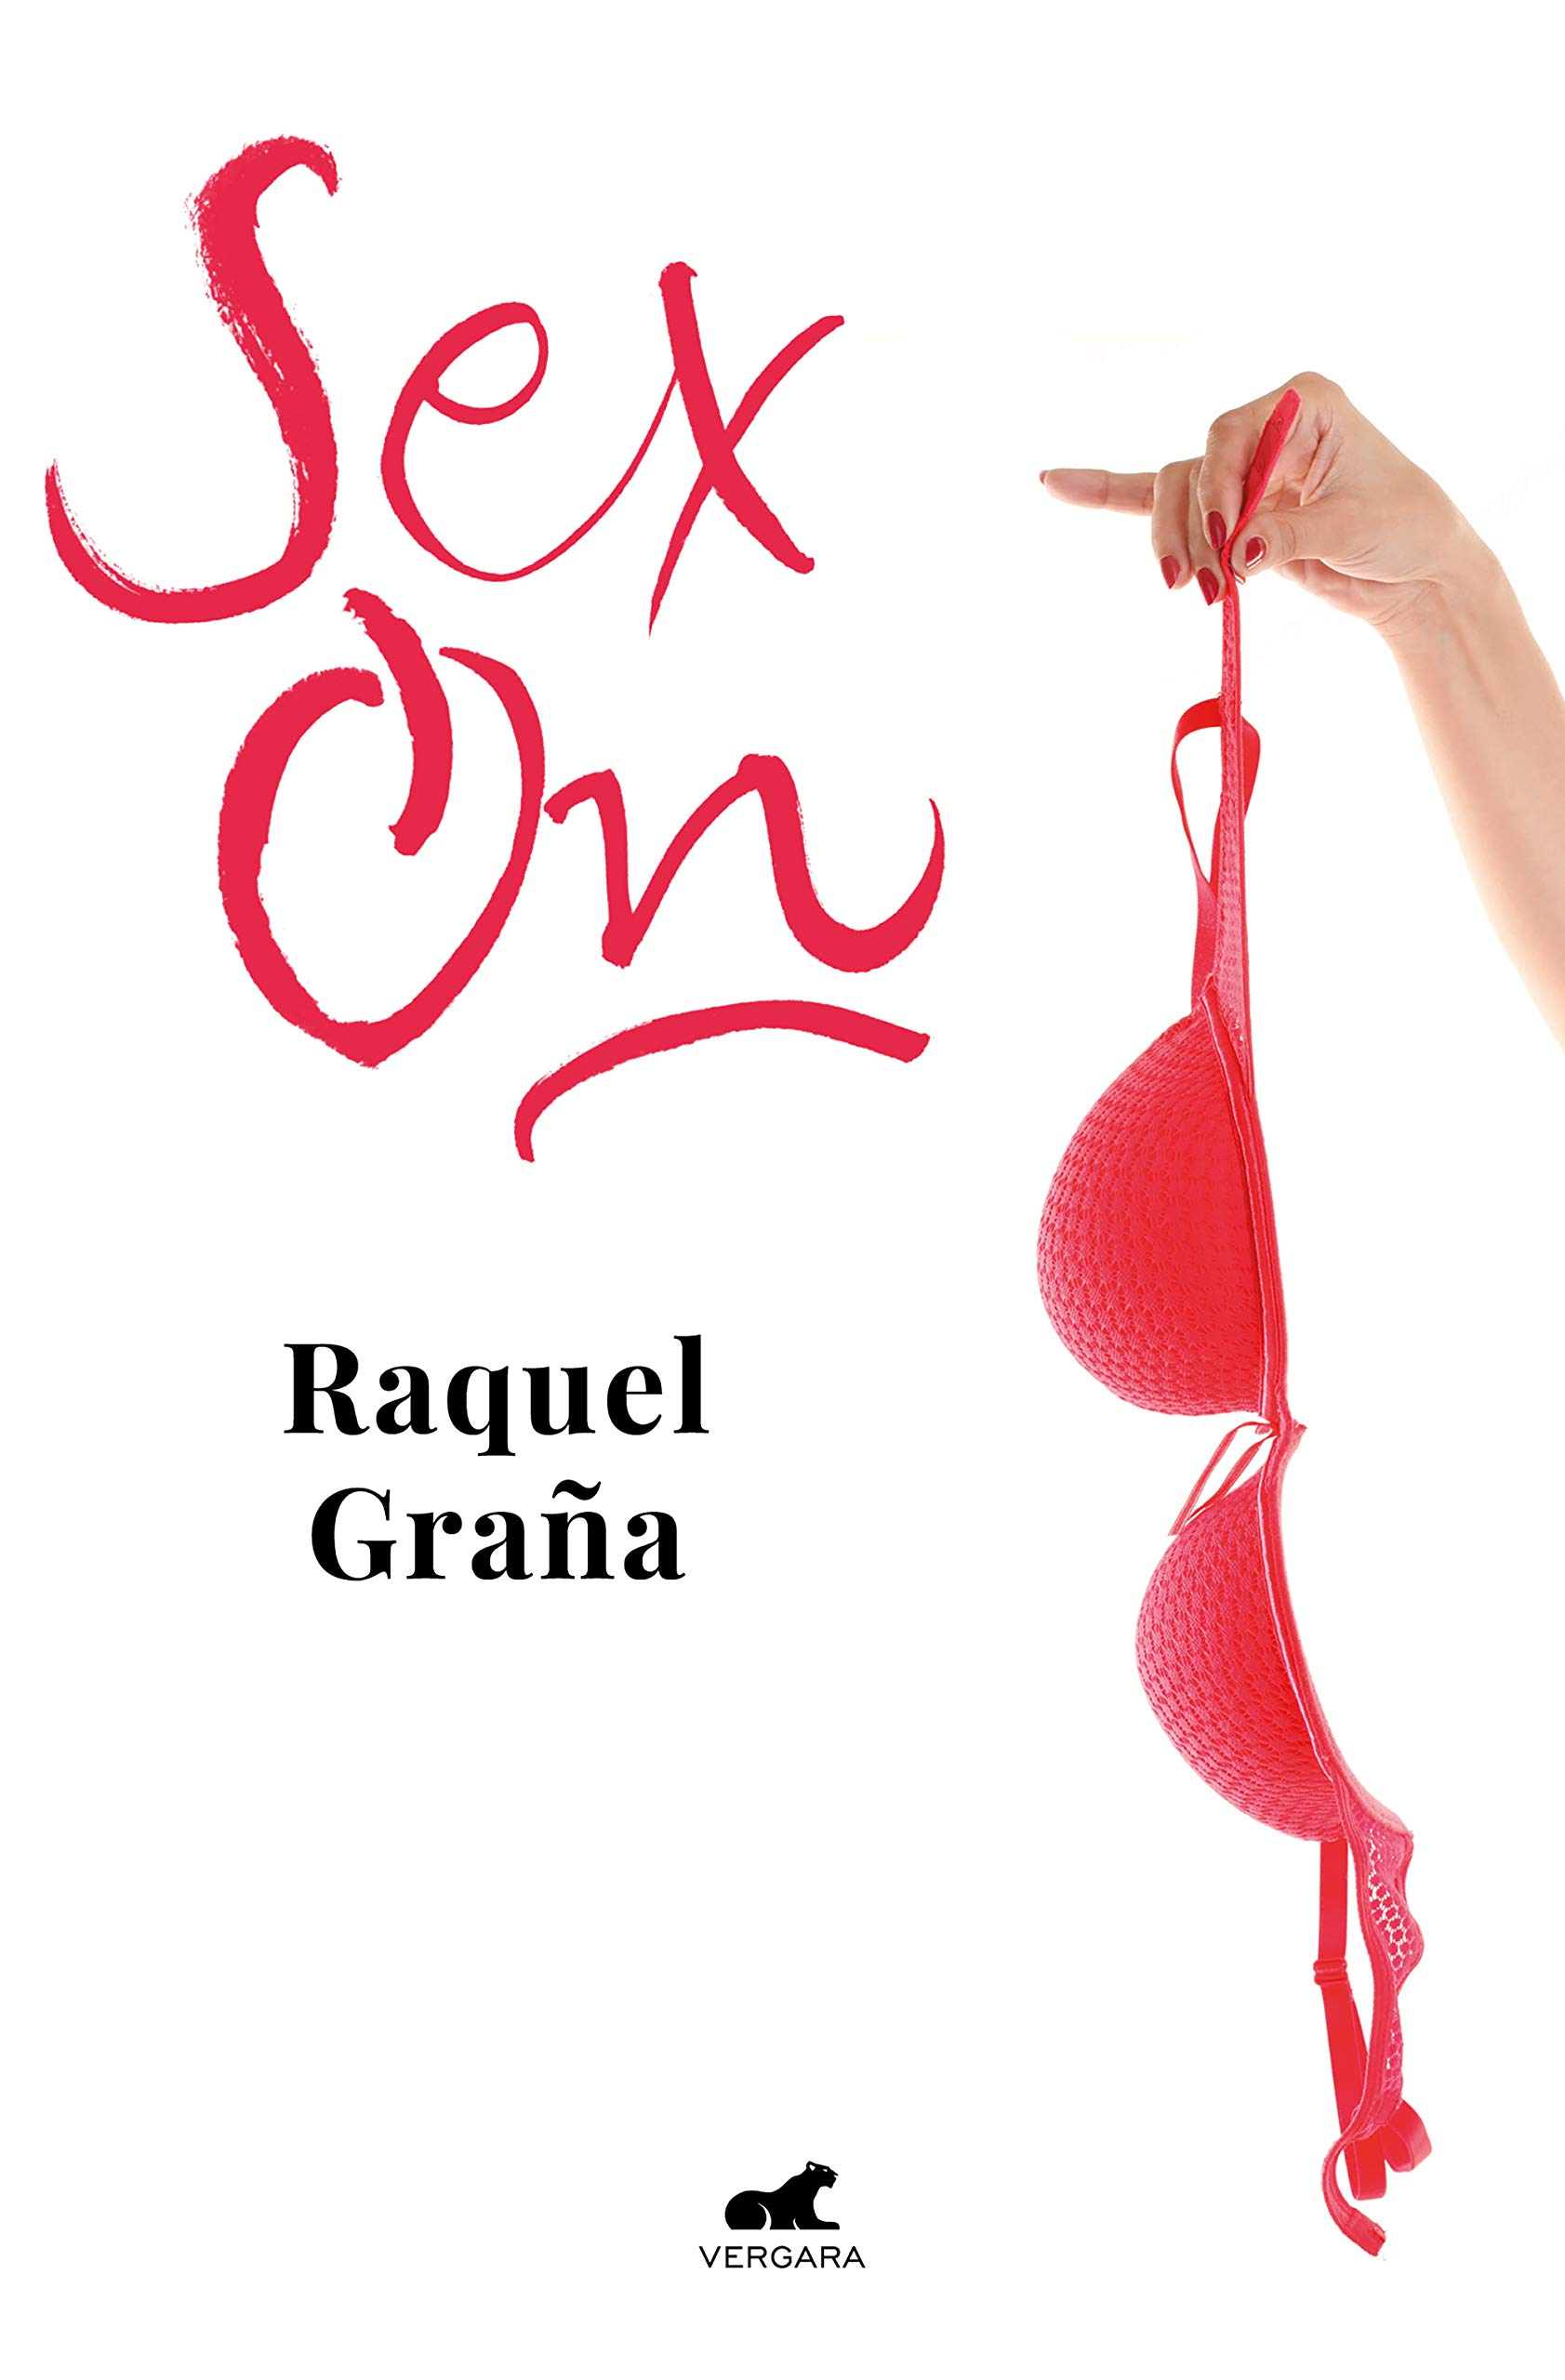 Sex-On (Libro práctico): Amazon.es: Graña, Raquel: Libros